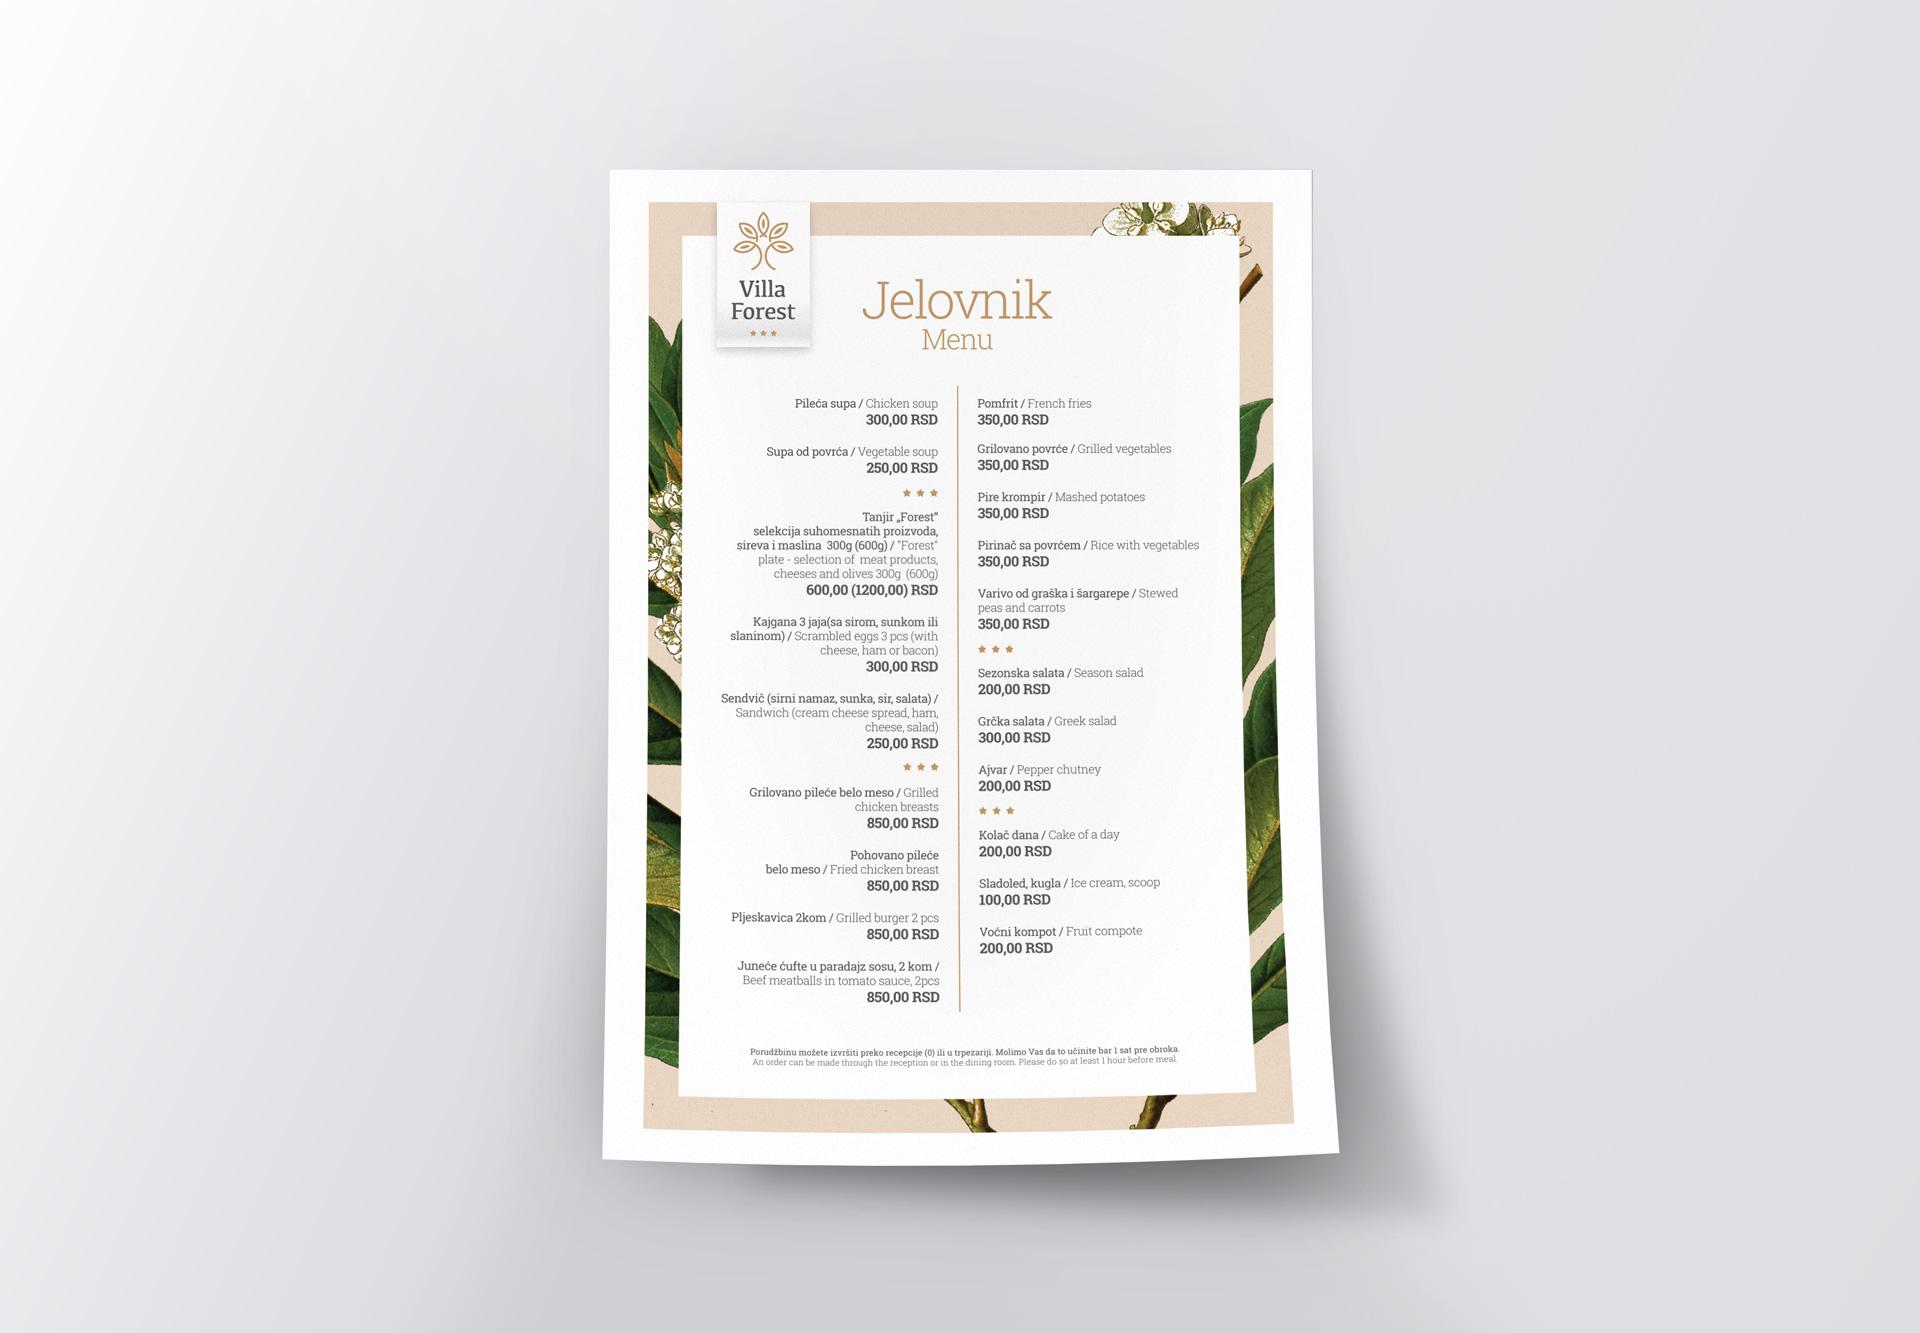 Dizajn A4 menija restorana hotela Villa Forest